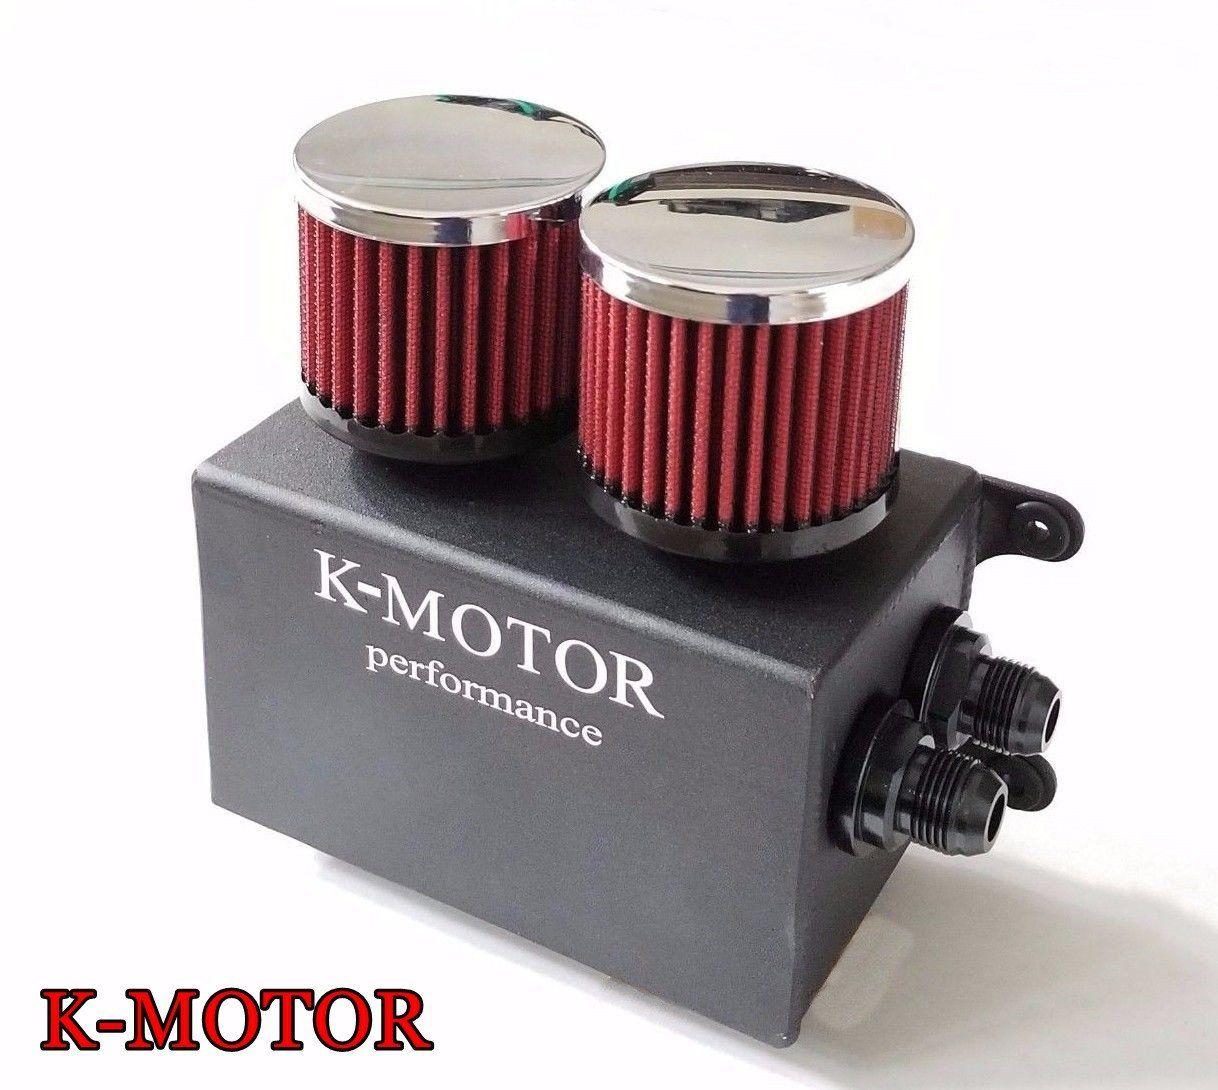 Oil Catch Reservoir Breather Can Tank Filter Kit Cylinder Aluminum Engine Blcak